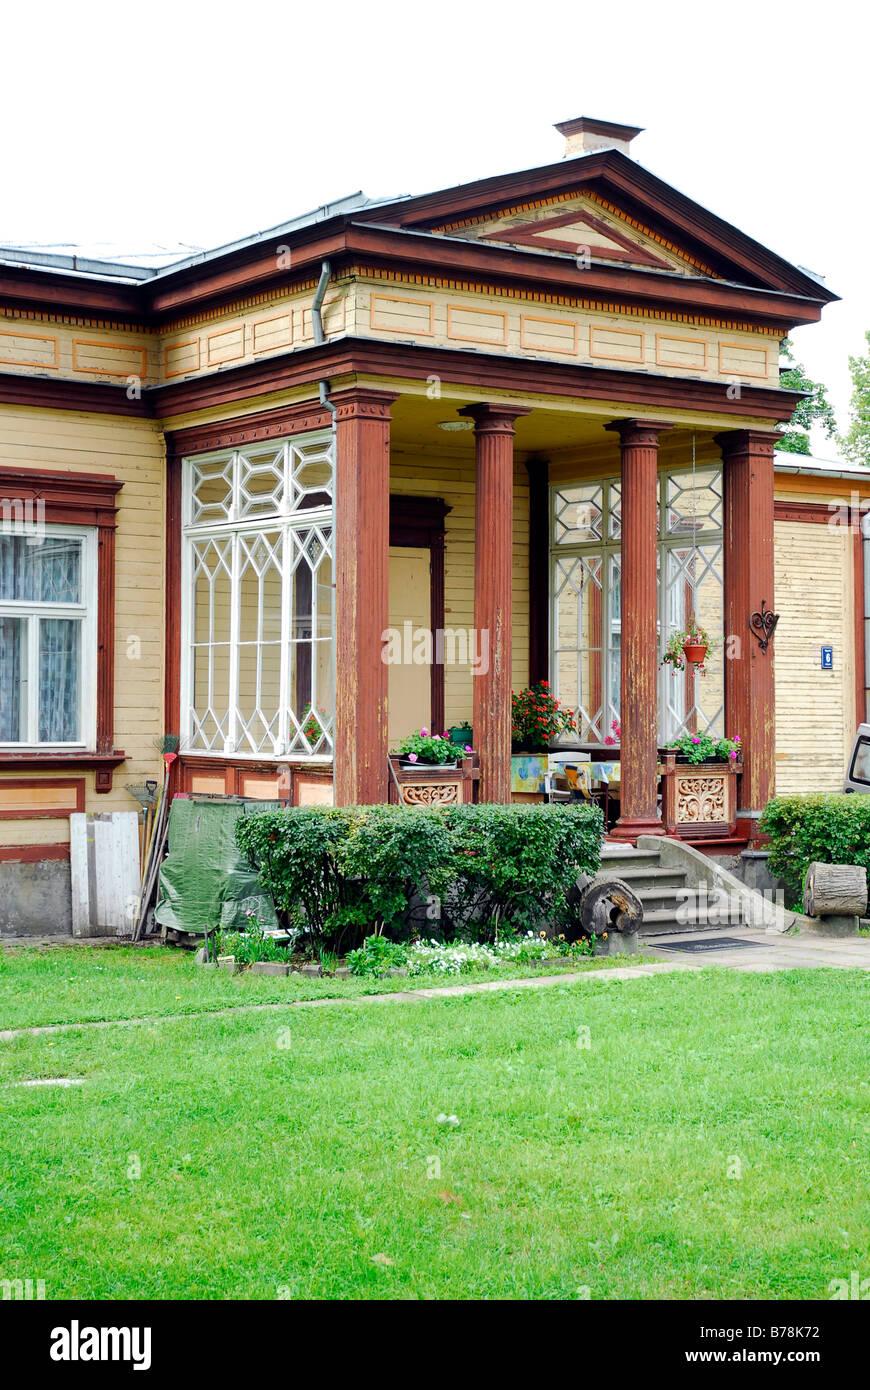 Summer house and garden, nostalgic noblesse with pillars in Majori, Baltic Sea resort Jurmala, Latvia, Baltic Sea, - Stock Image